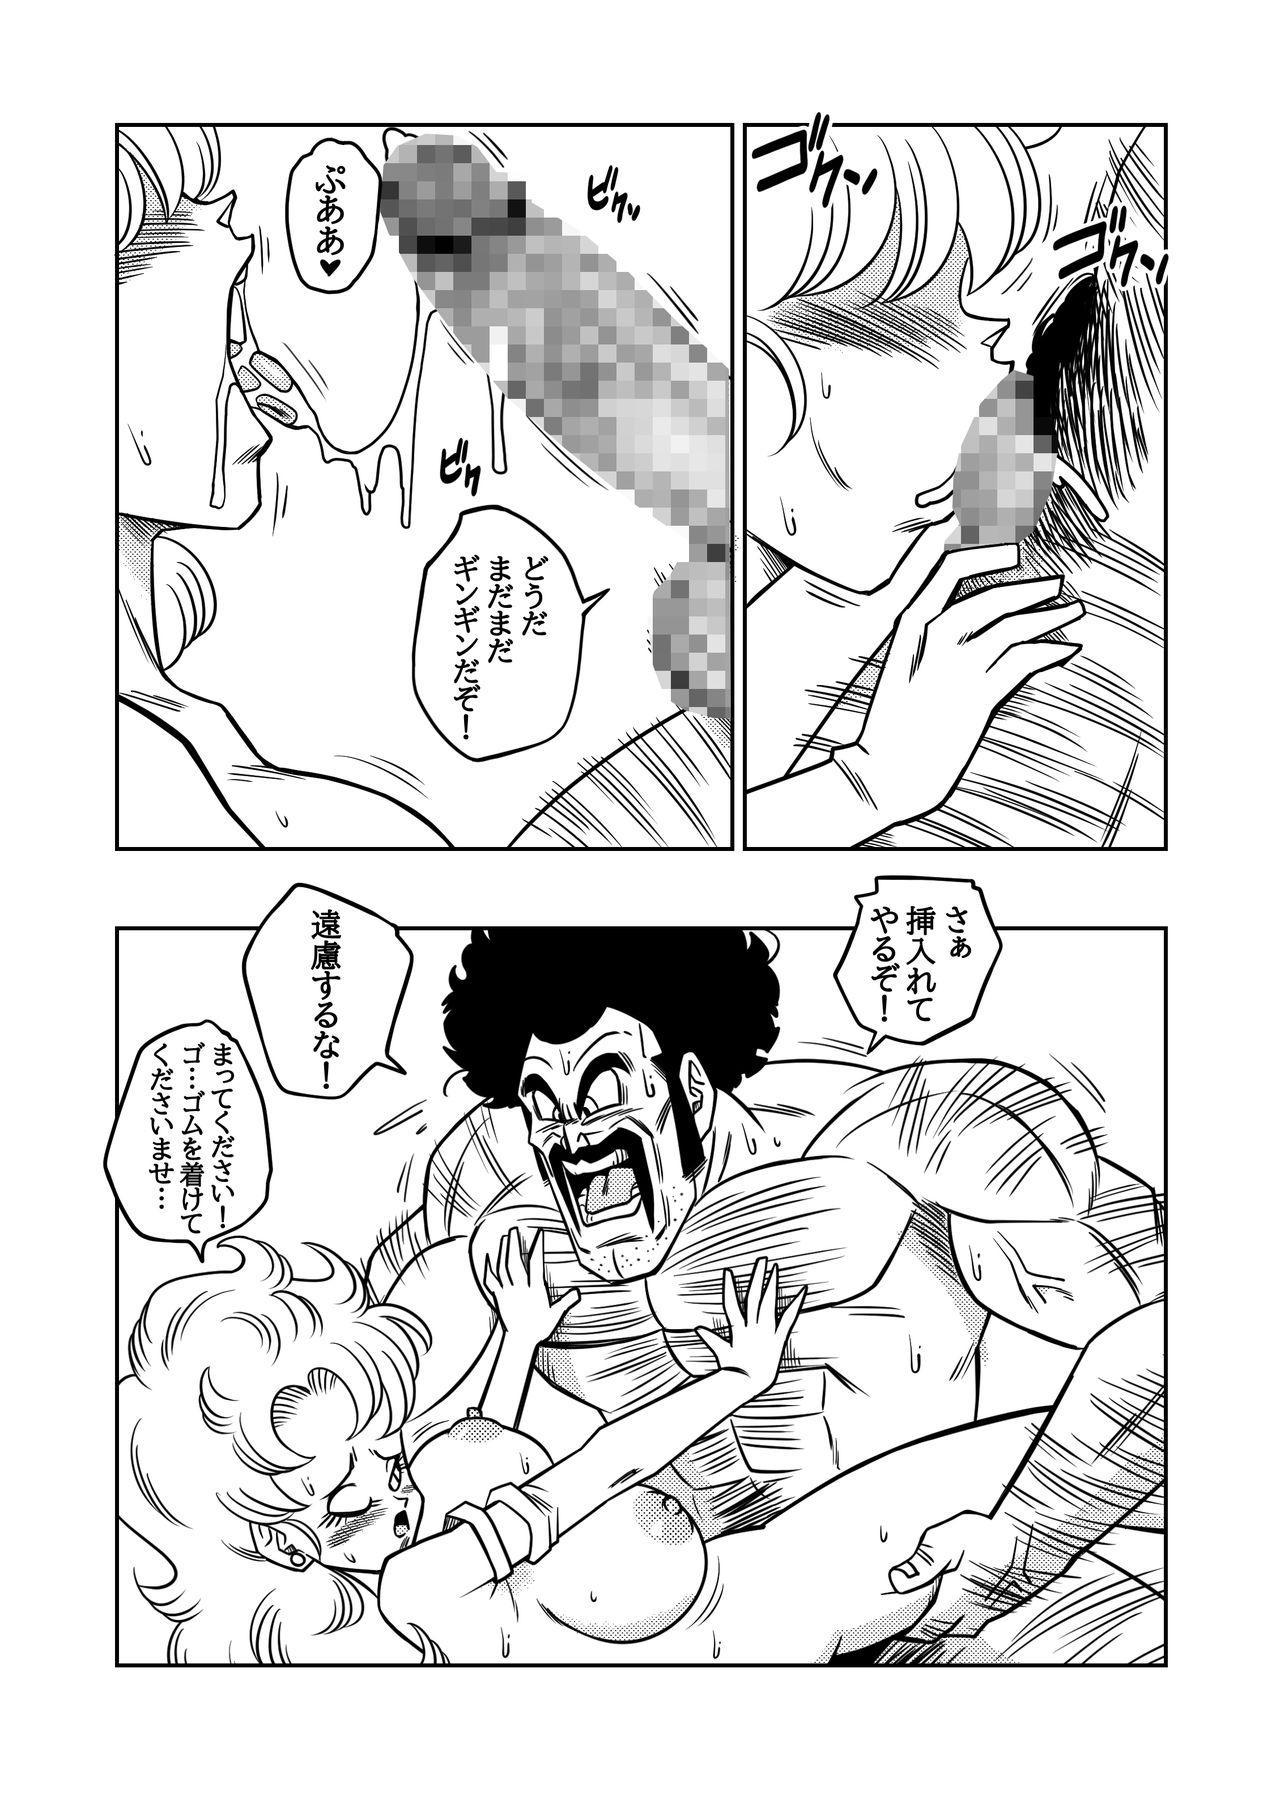 Mister Satan no Himitsu no Training 10